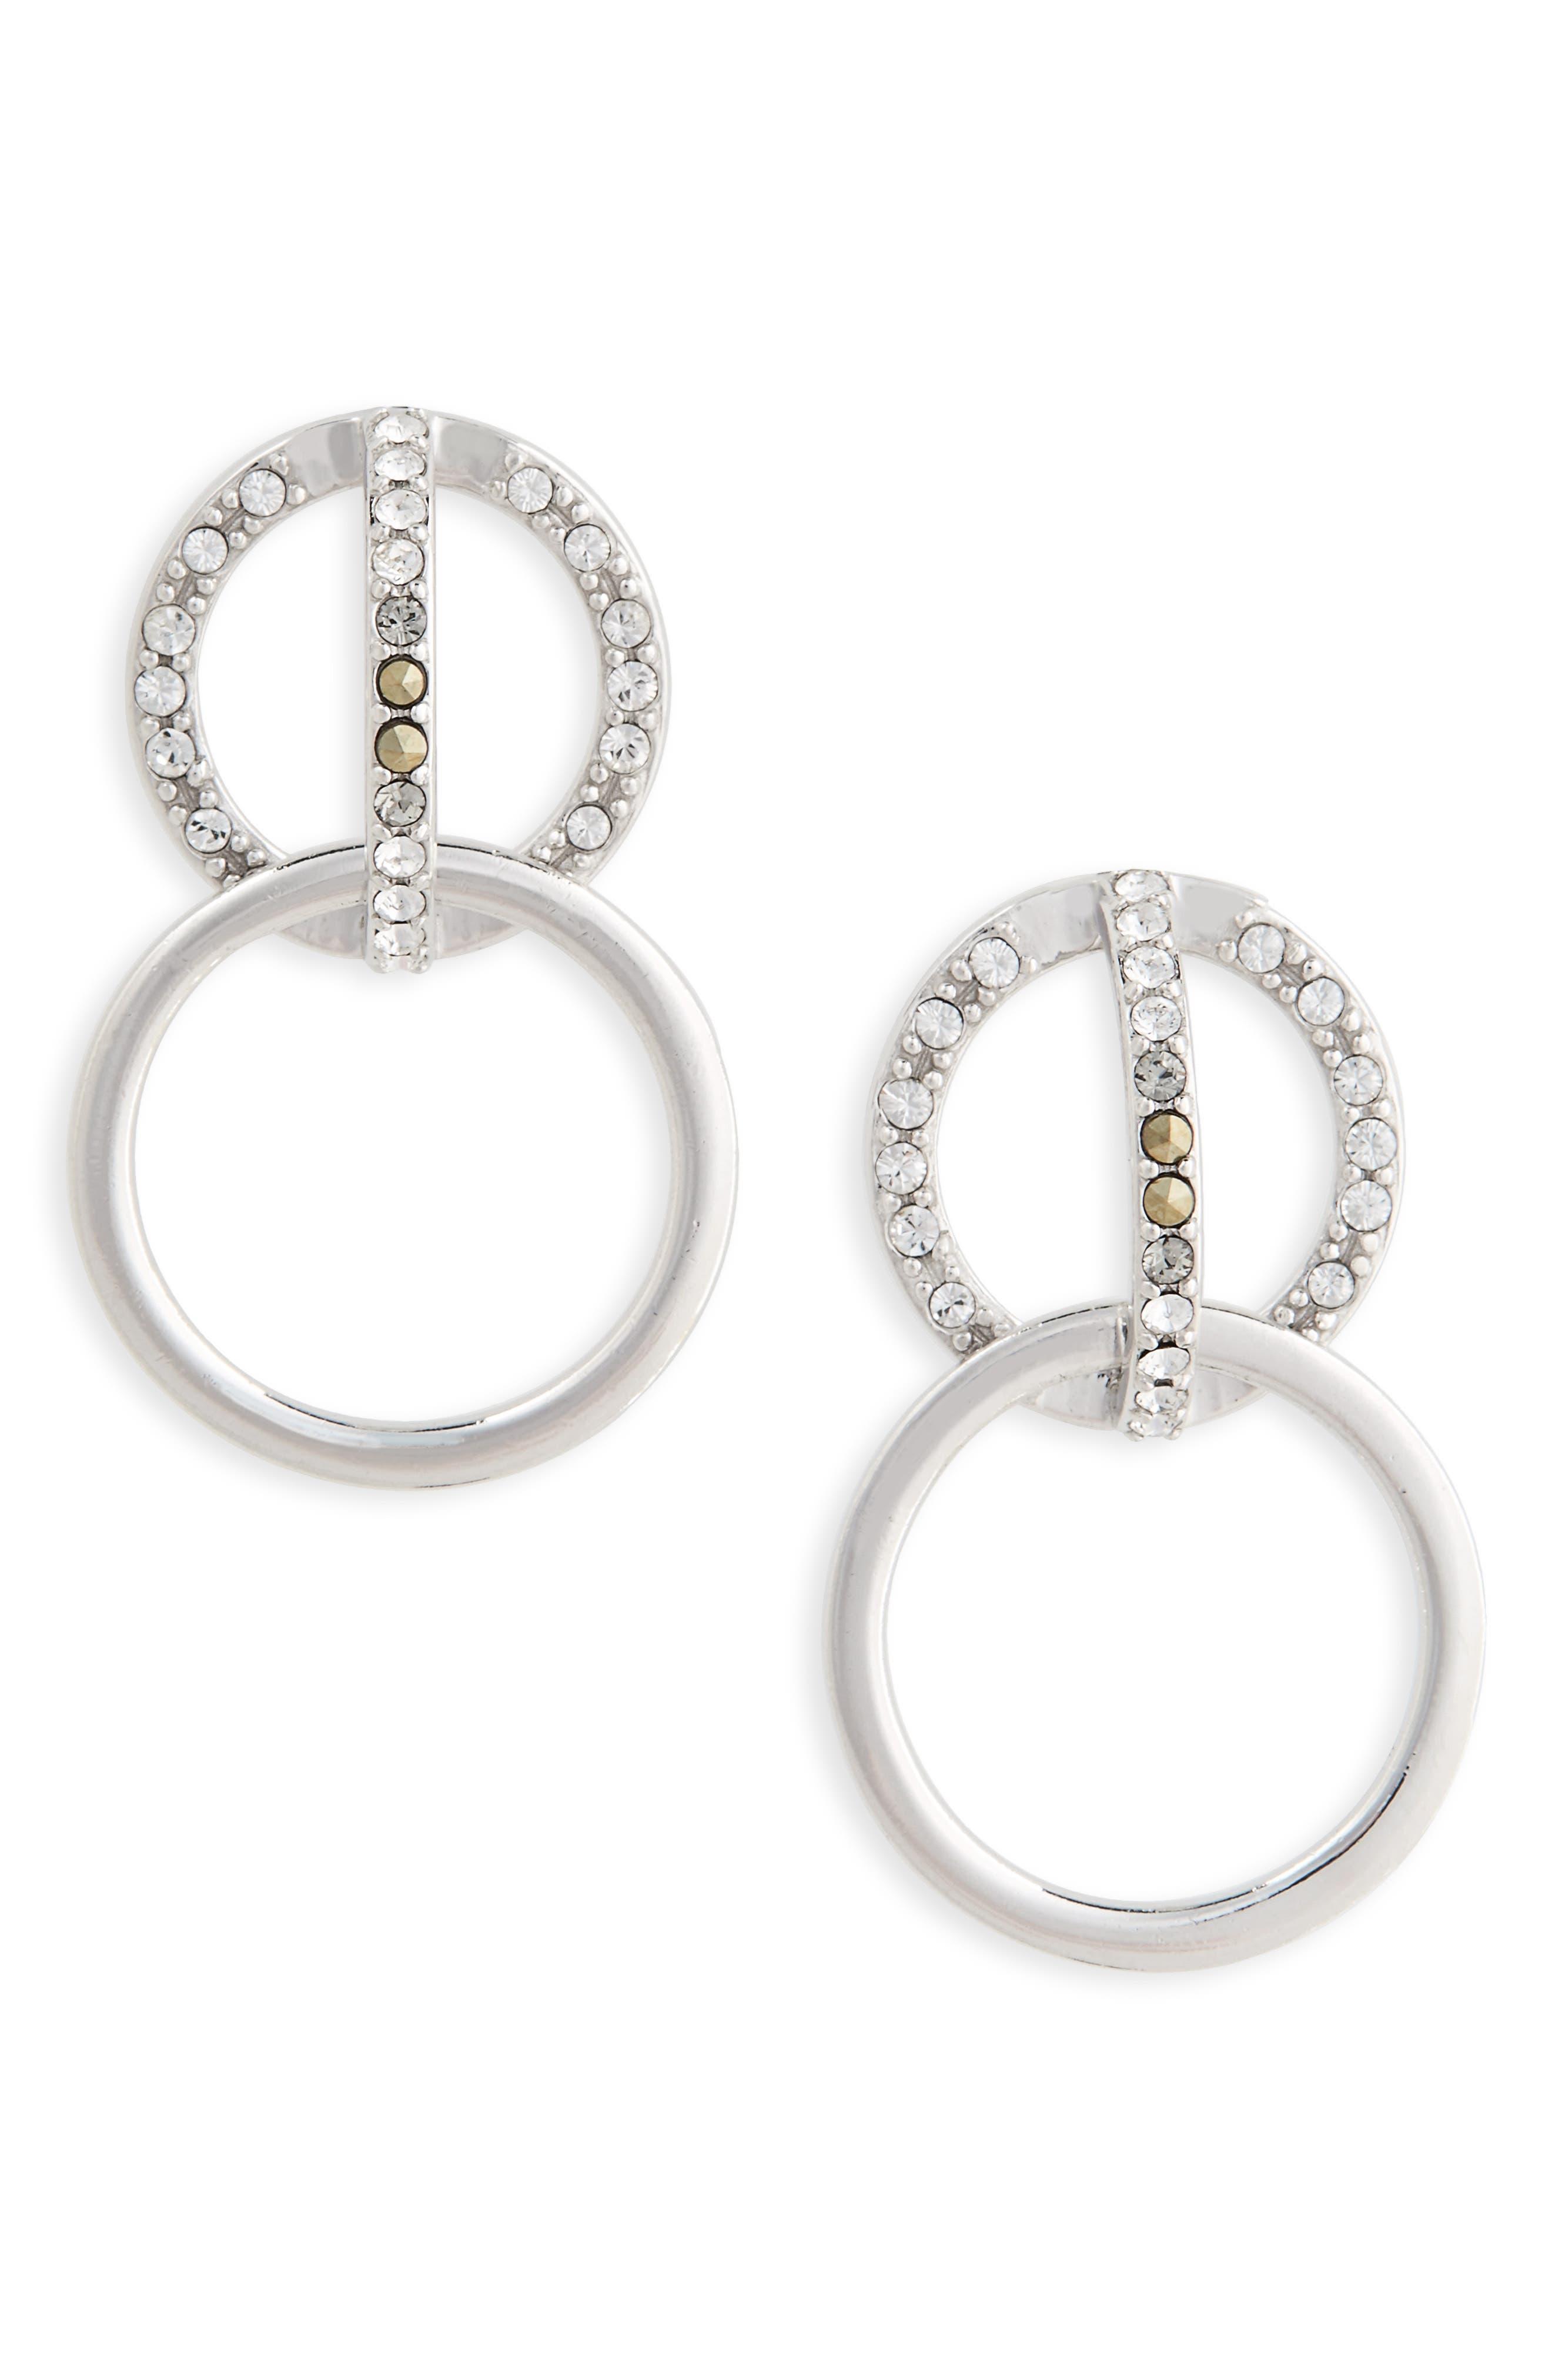 Main Image - Judith Jack Silver Sparkle Double Drop Earrings